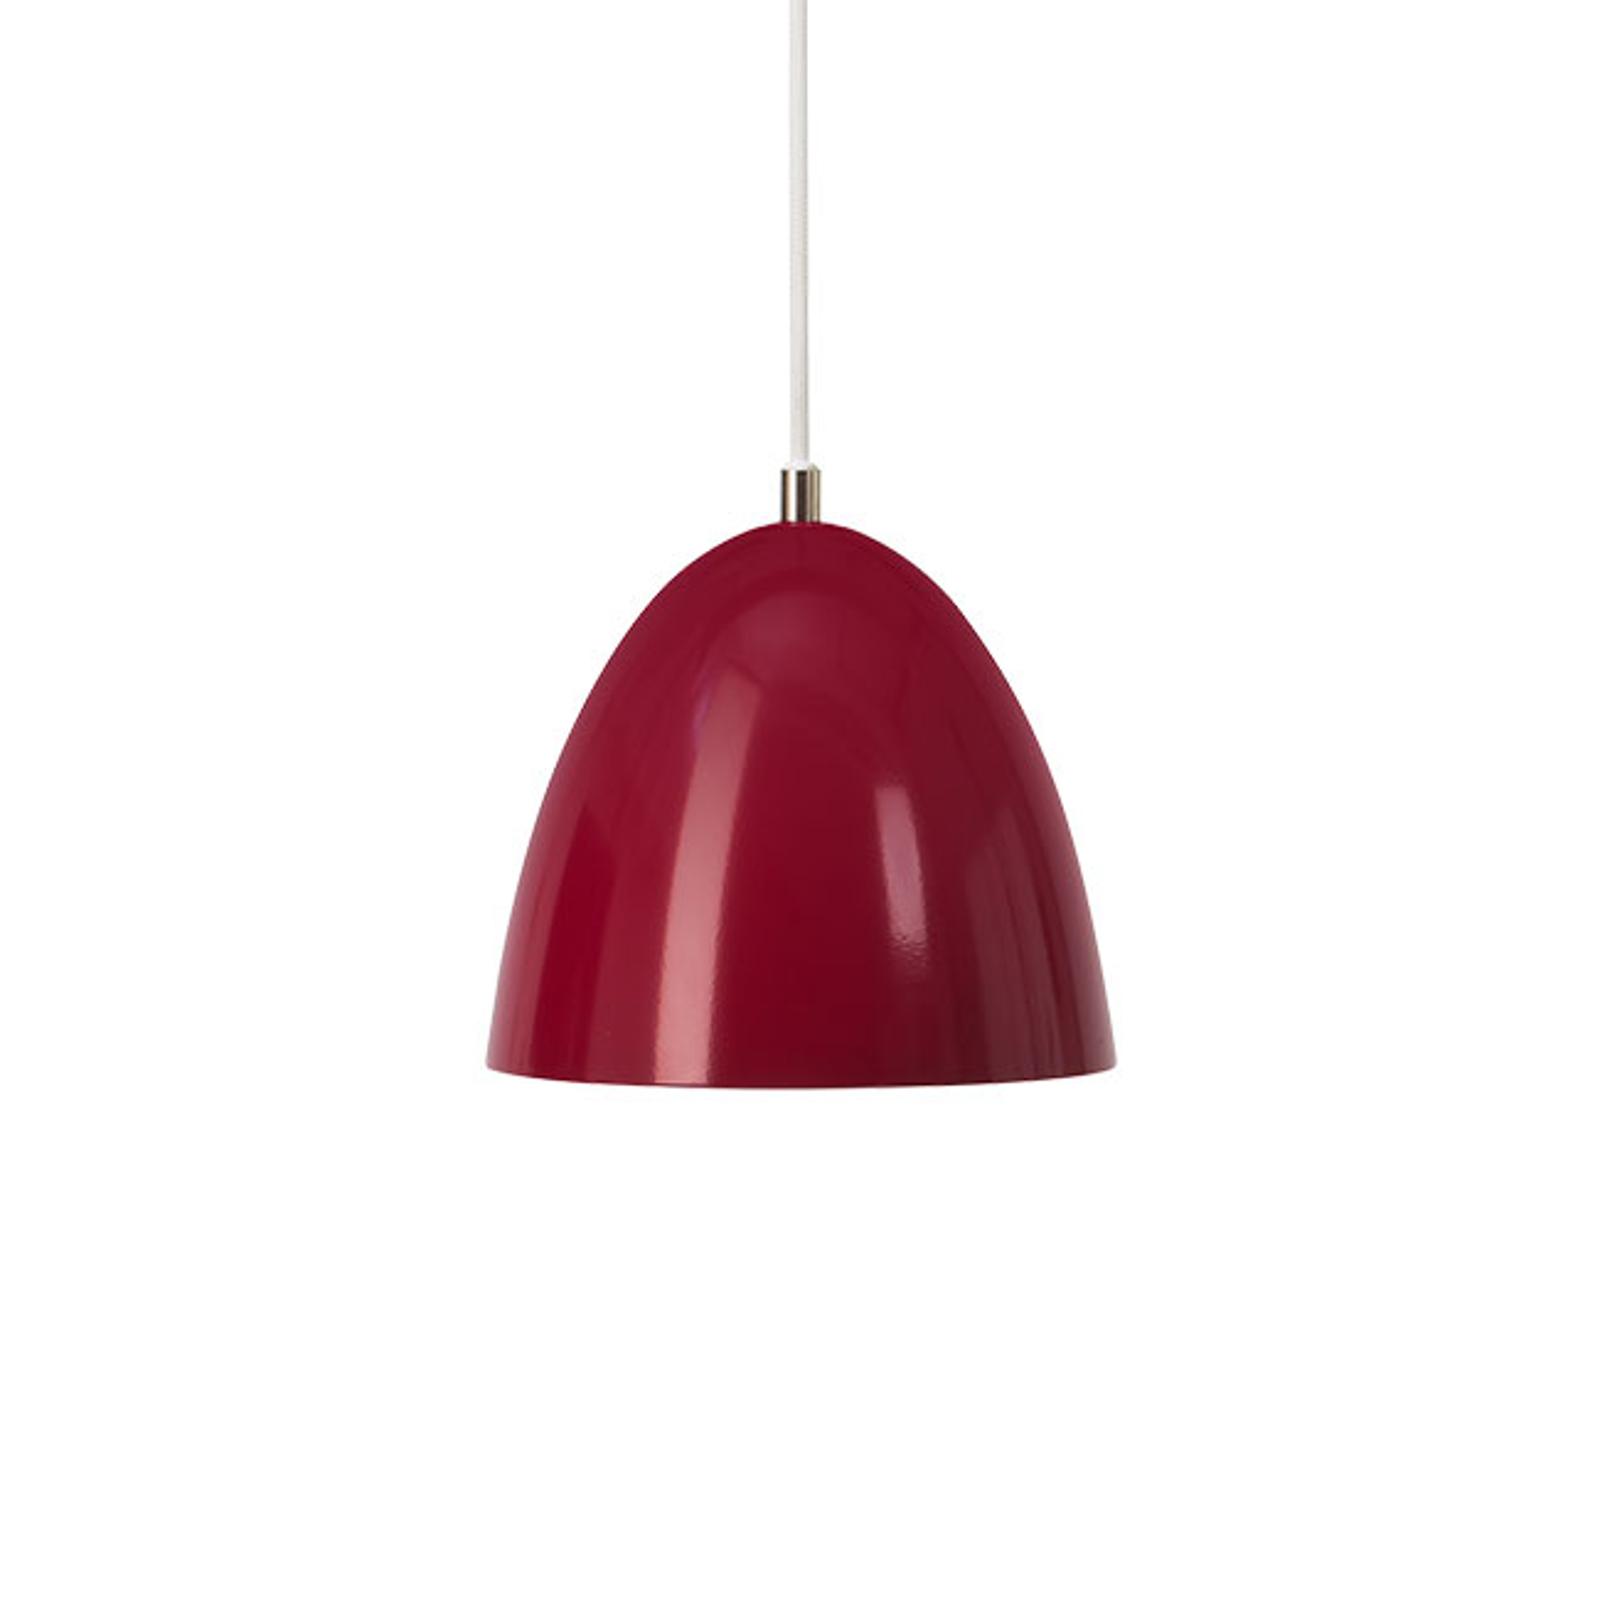 Suspension LED Eas, Ø 24cm, 3000K, rouge